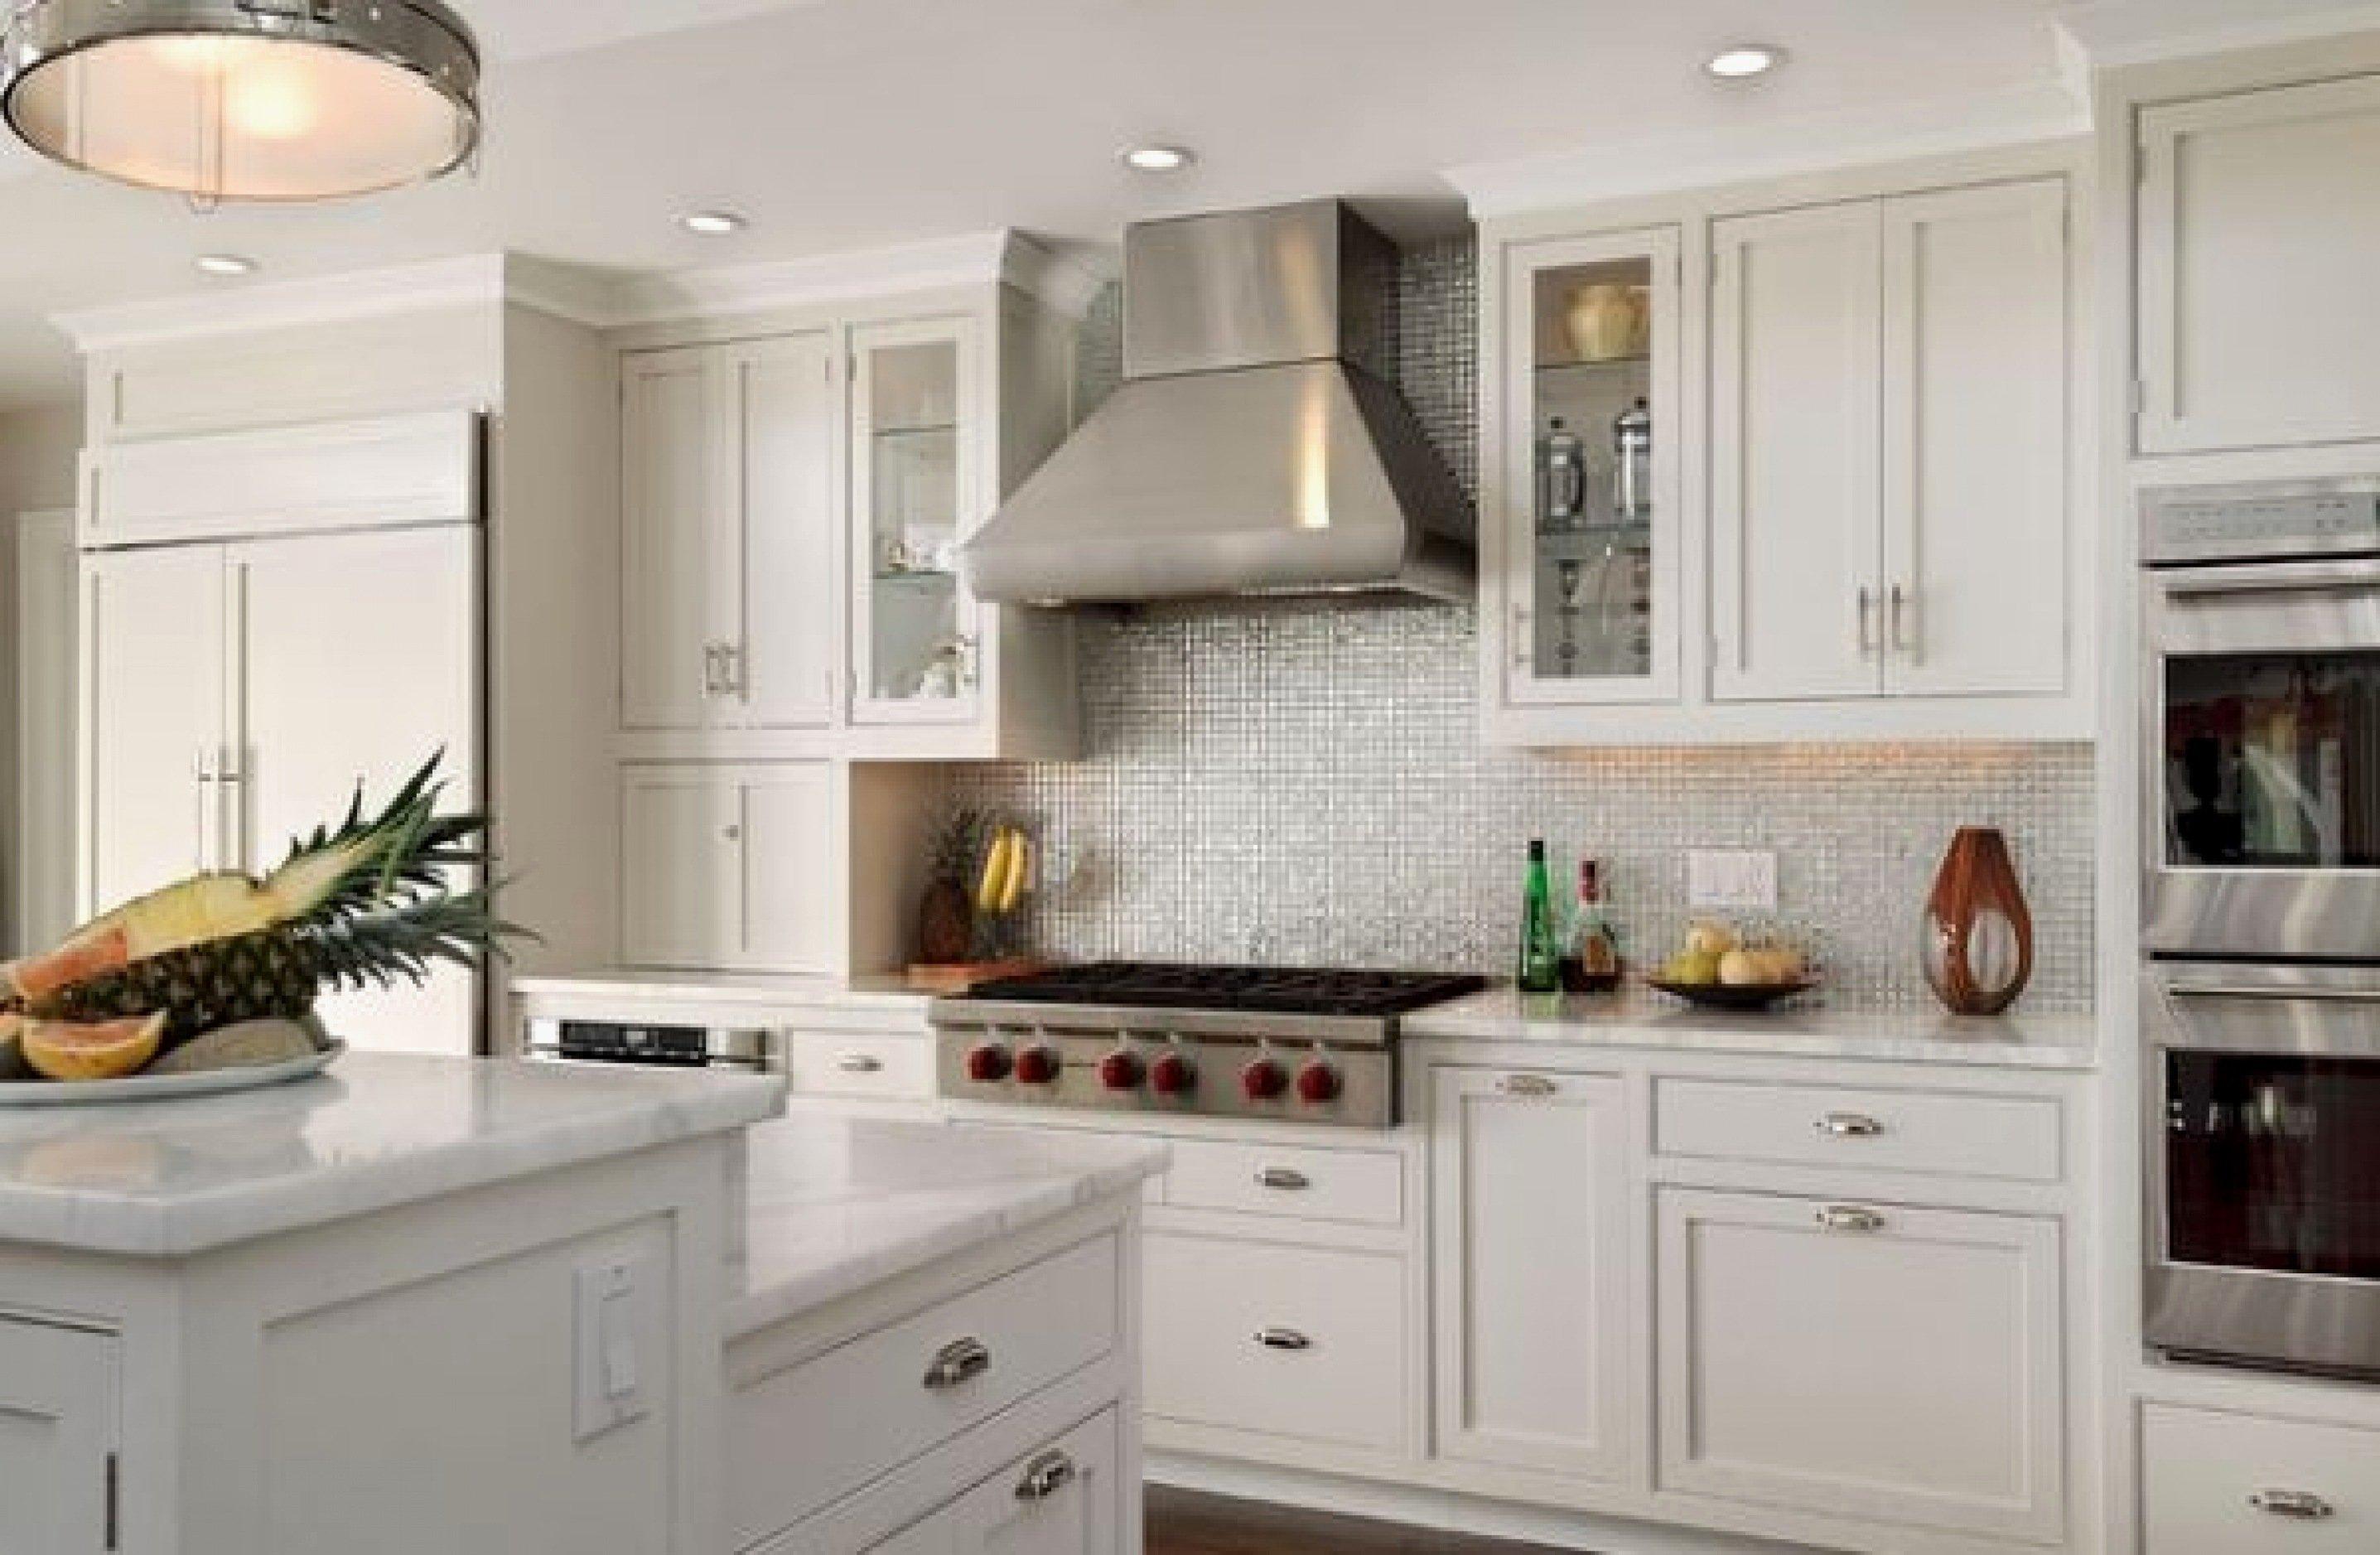 10 Unique Backsplash Ideas For White Cabinets kitchen backsplash ideas with white cabinets best of kitchen 2021